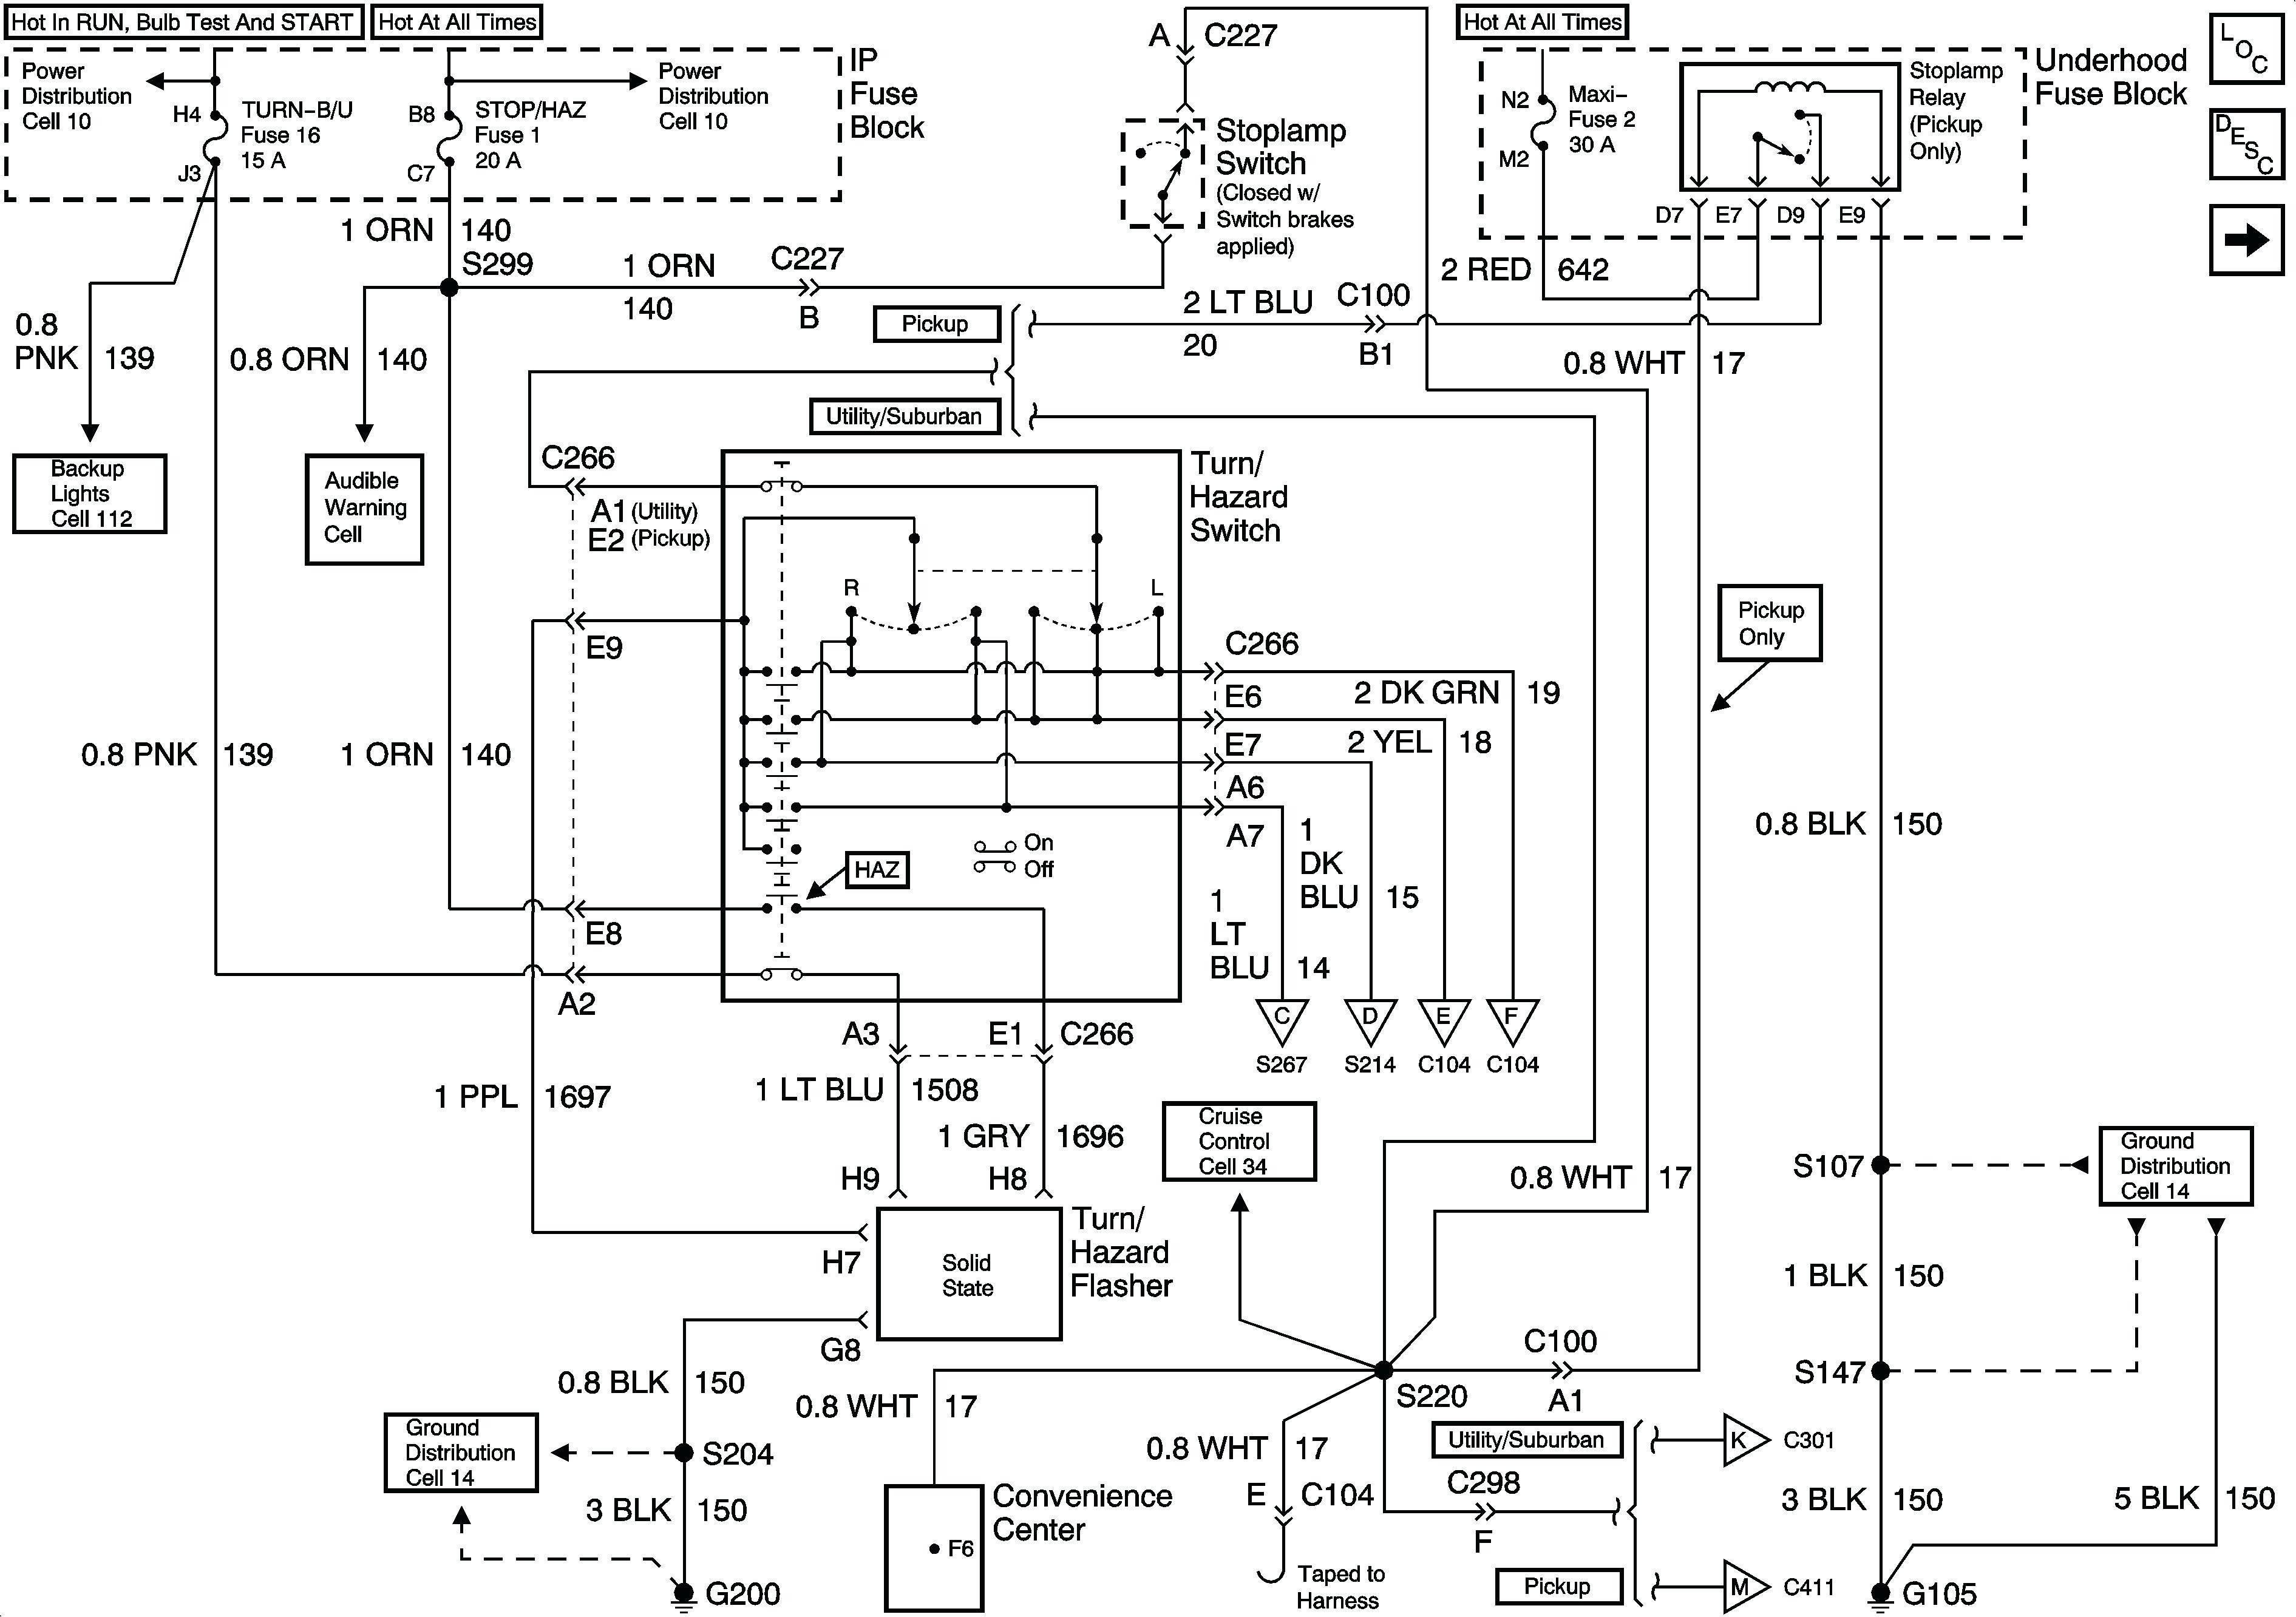 Toyota Corolla Engine Diagram toyota Corolla Undercarriage Diagram Awesome Wiring Diagram Of Toyota Corolla Engine Diagram